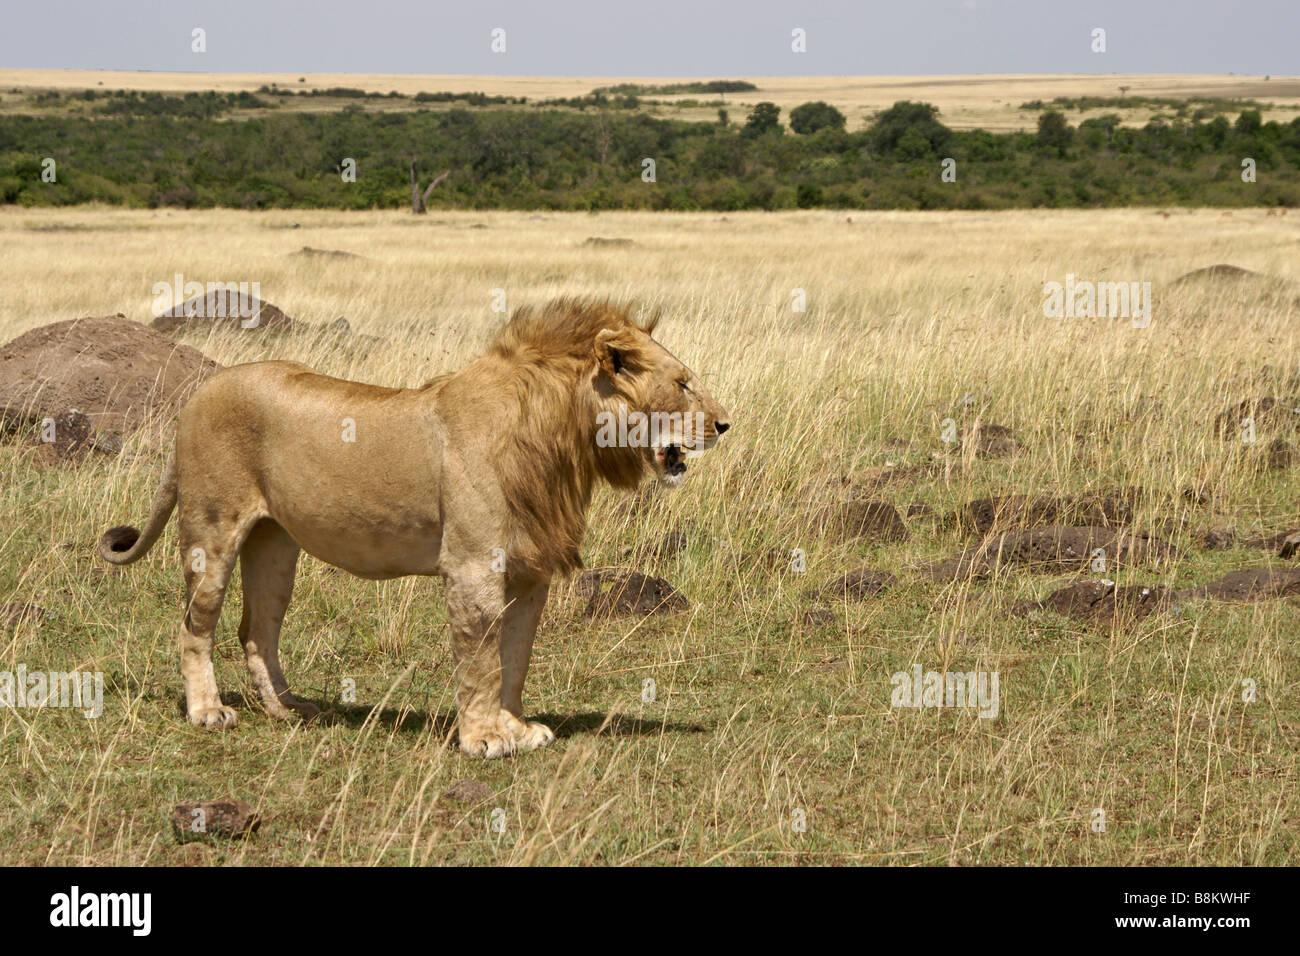 Male lion on the savanna, Masai Mara, Kenya - Stock Image